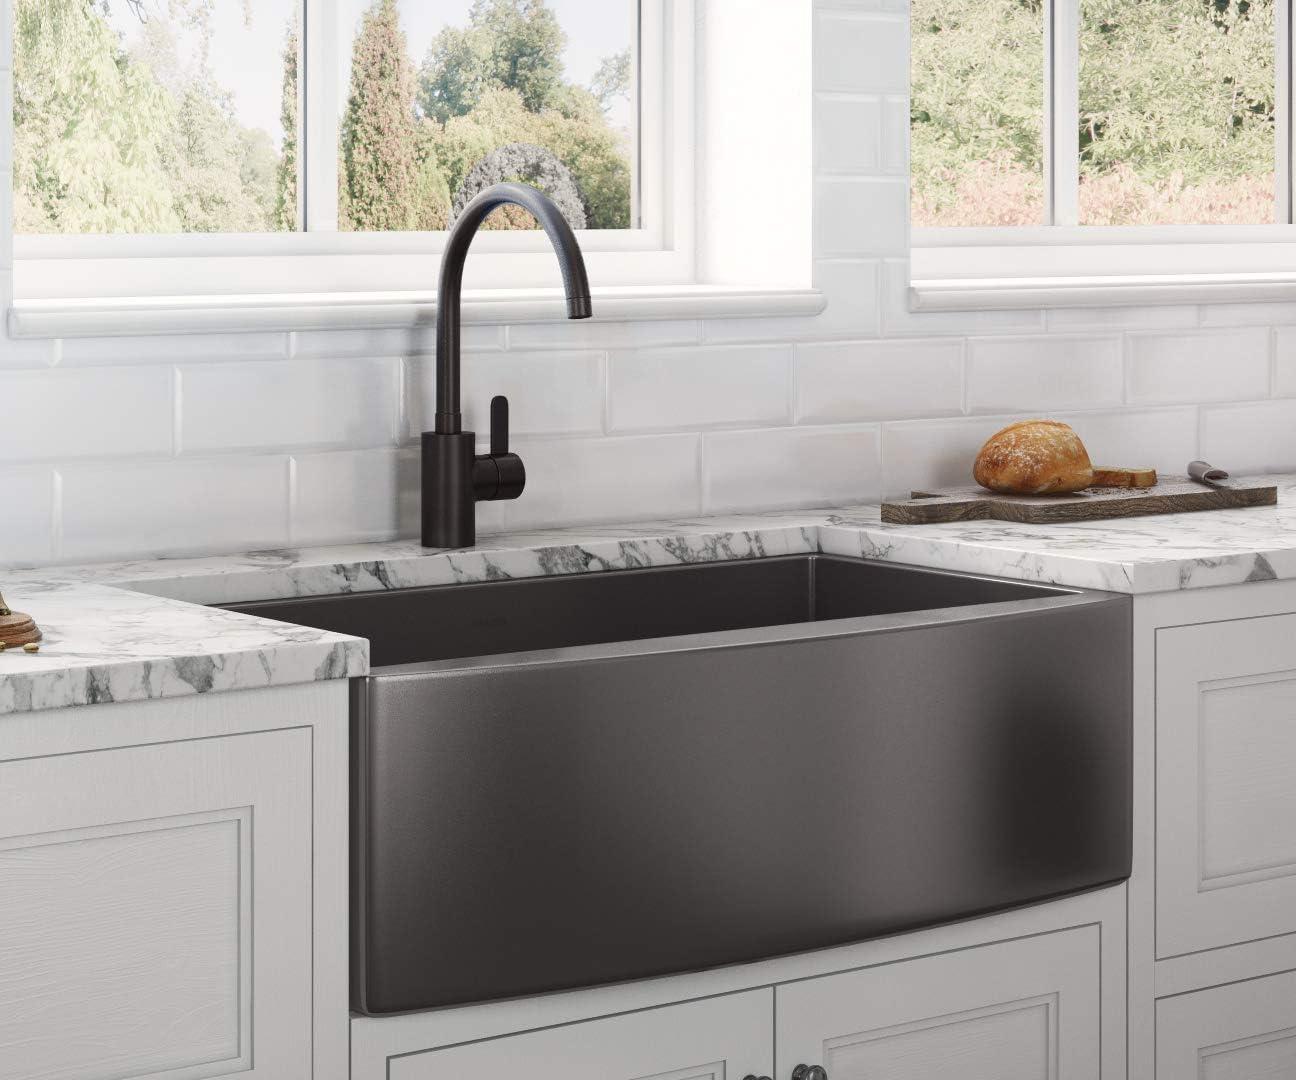 Ruvati Gunmetal Black Matte Stainless Steel 33 Inch Apron Front Farmhouse Kitchen Sink Single Bowl Rvh9733bl Amazon Com